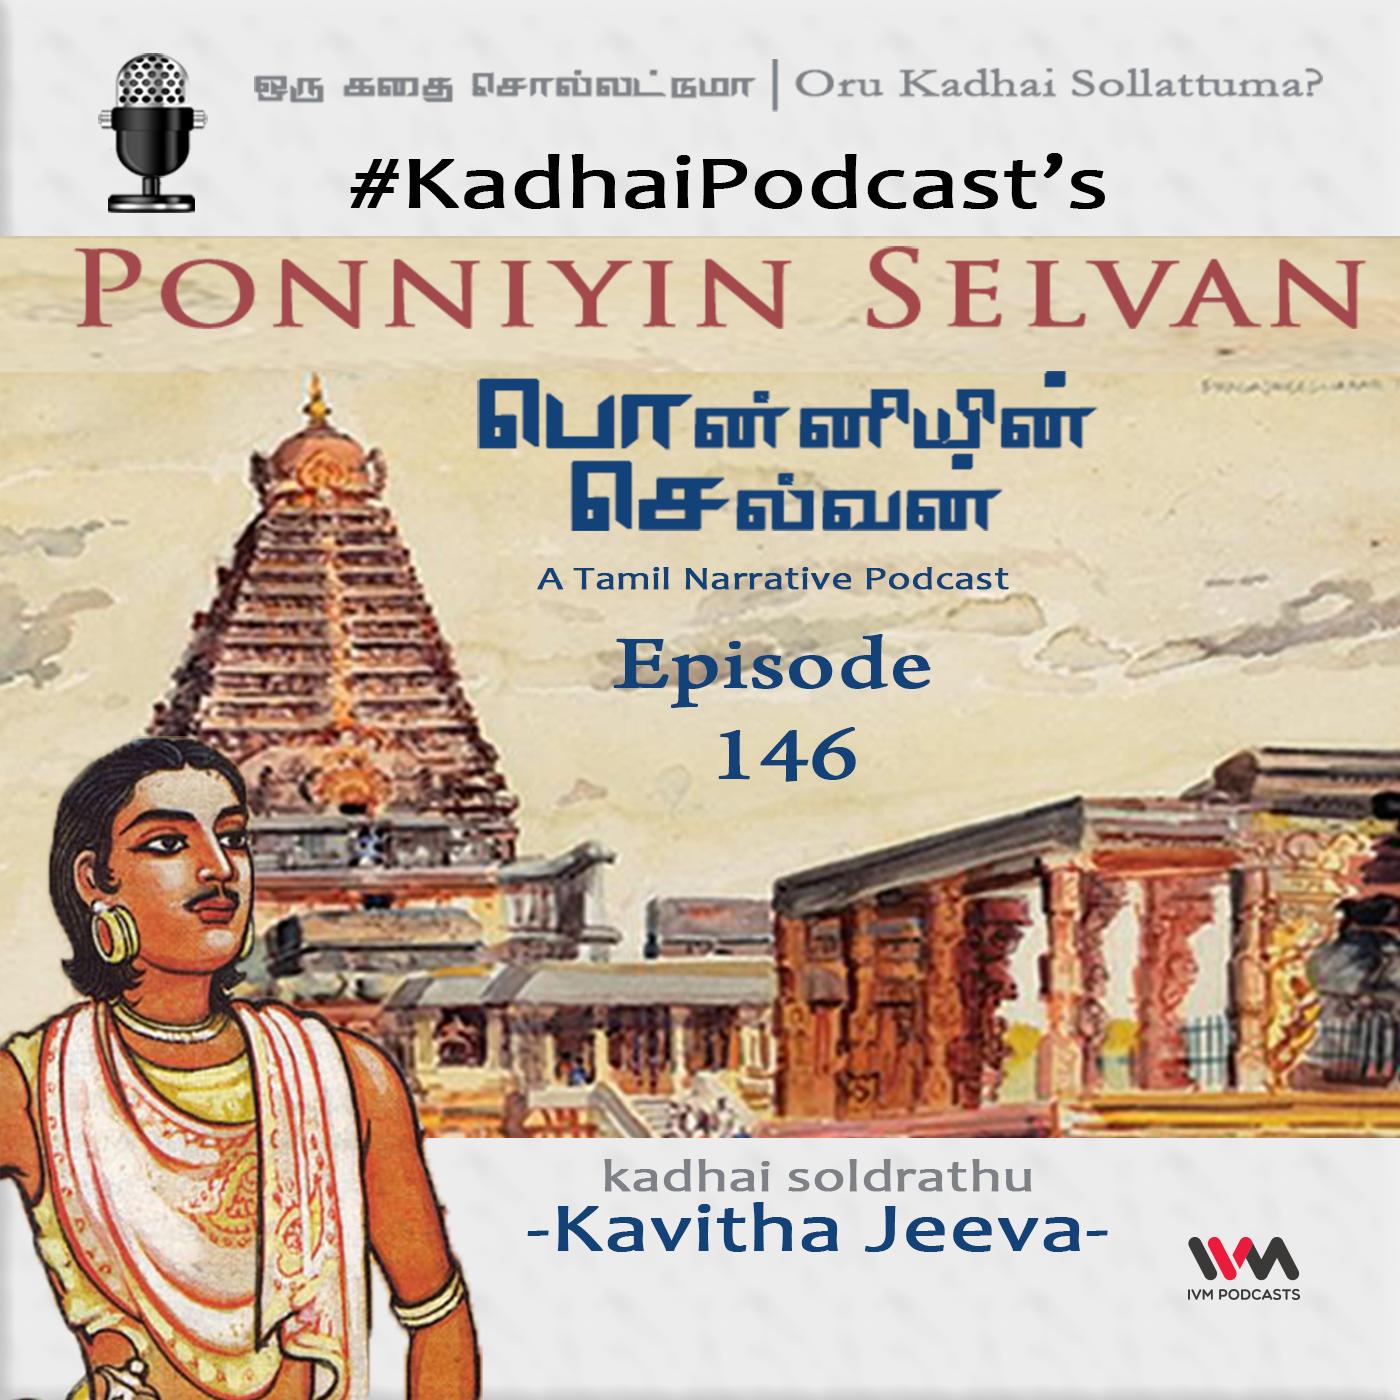 KadhaiPodcast's Ponniyin Selvan - Episode # 146